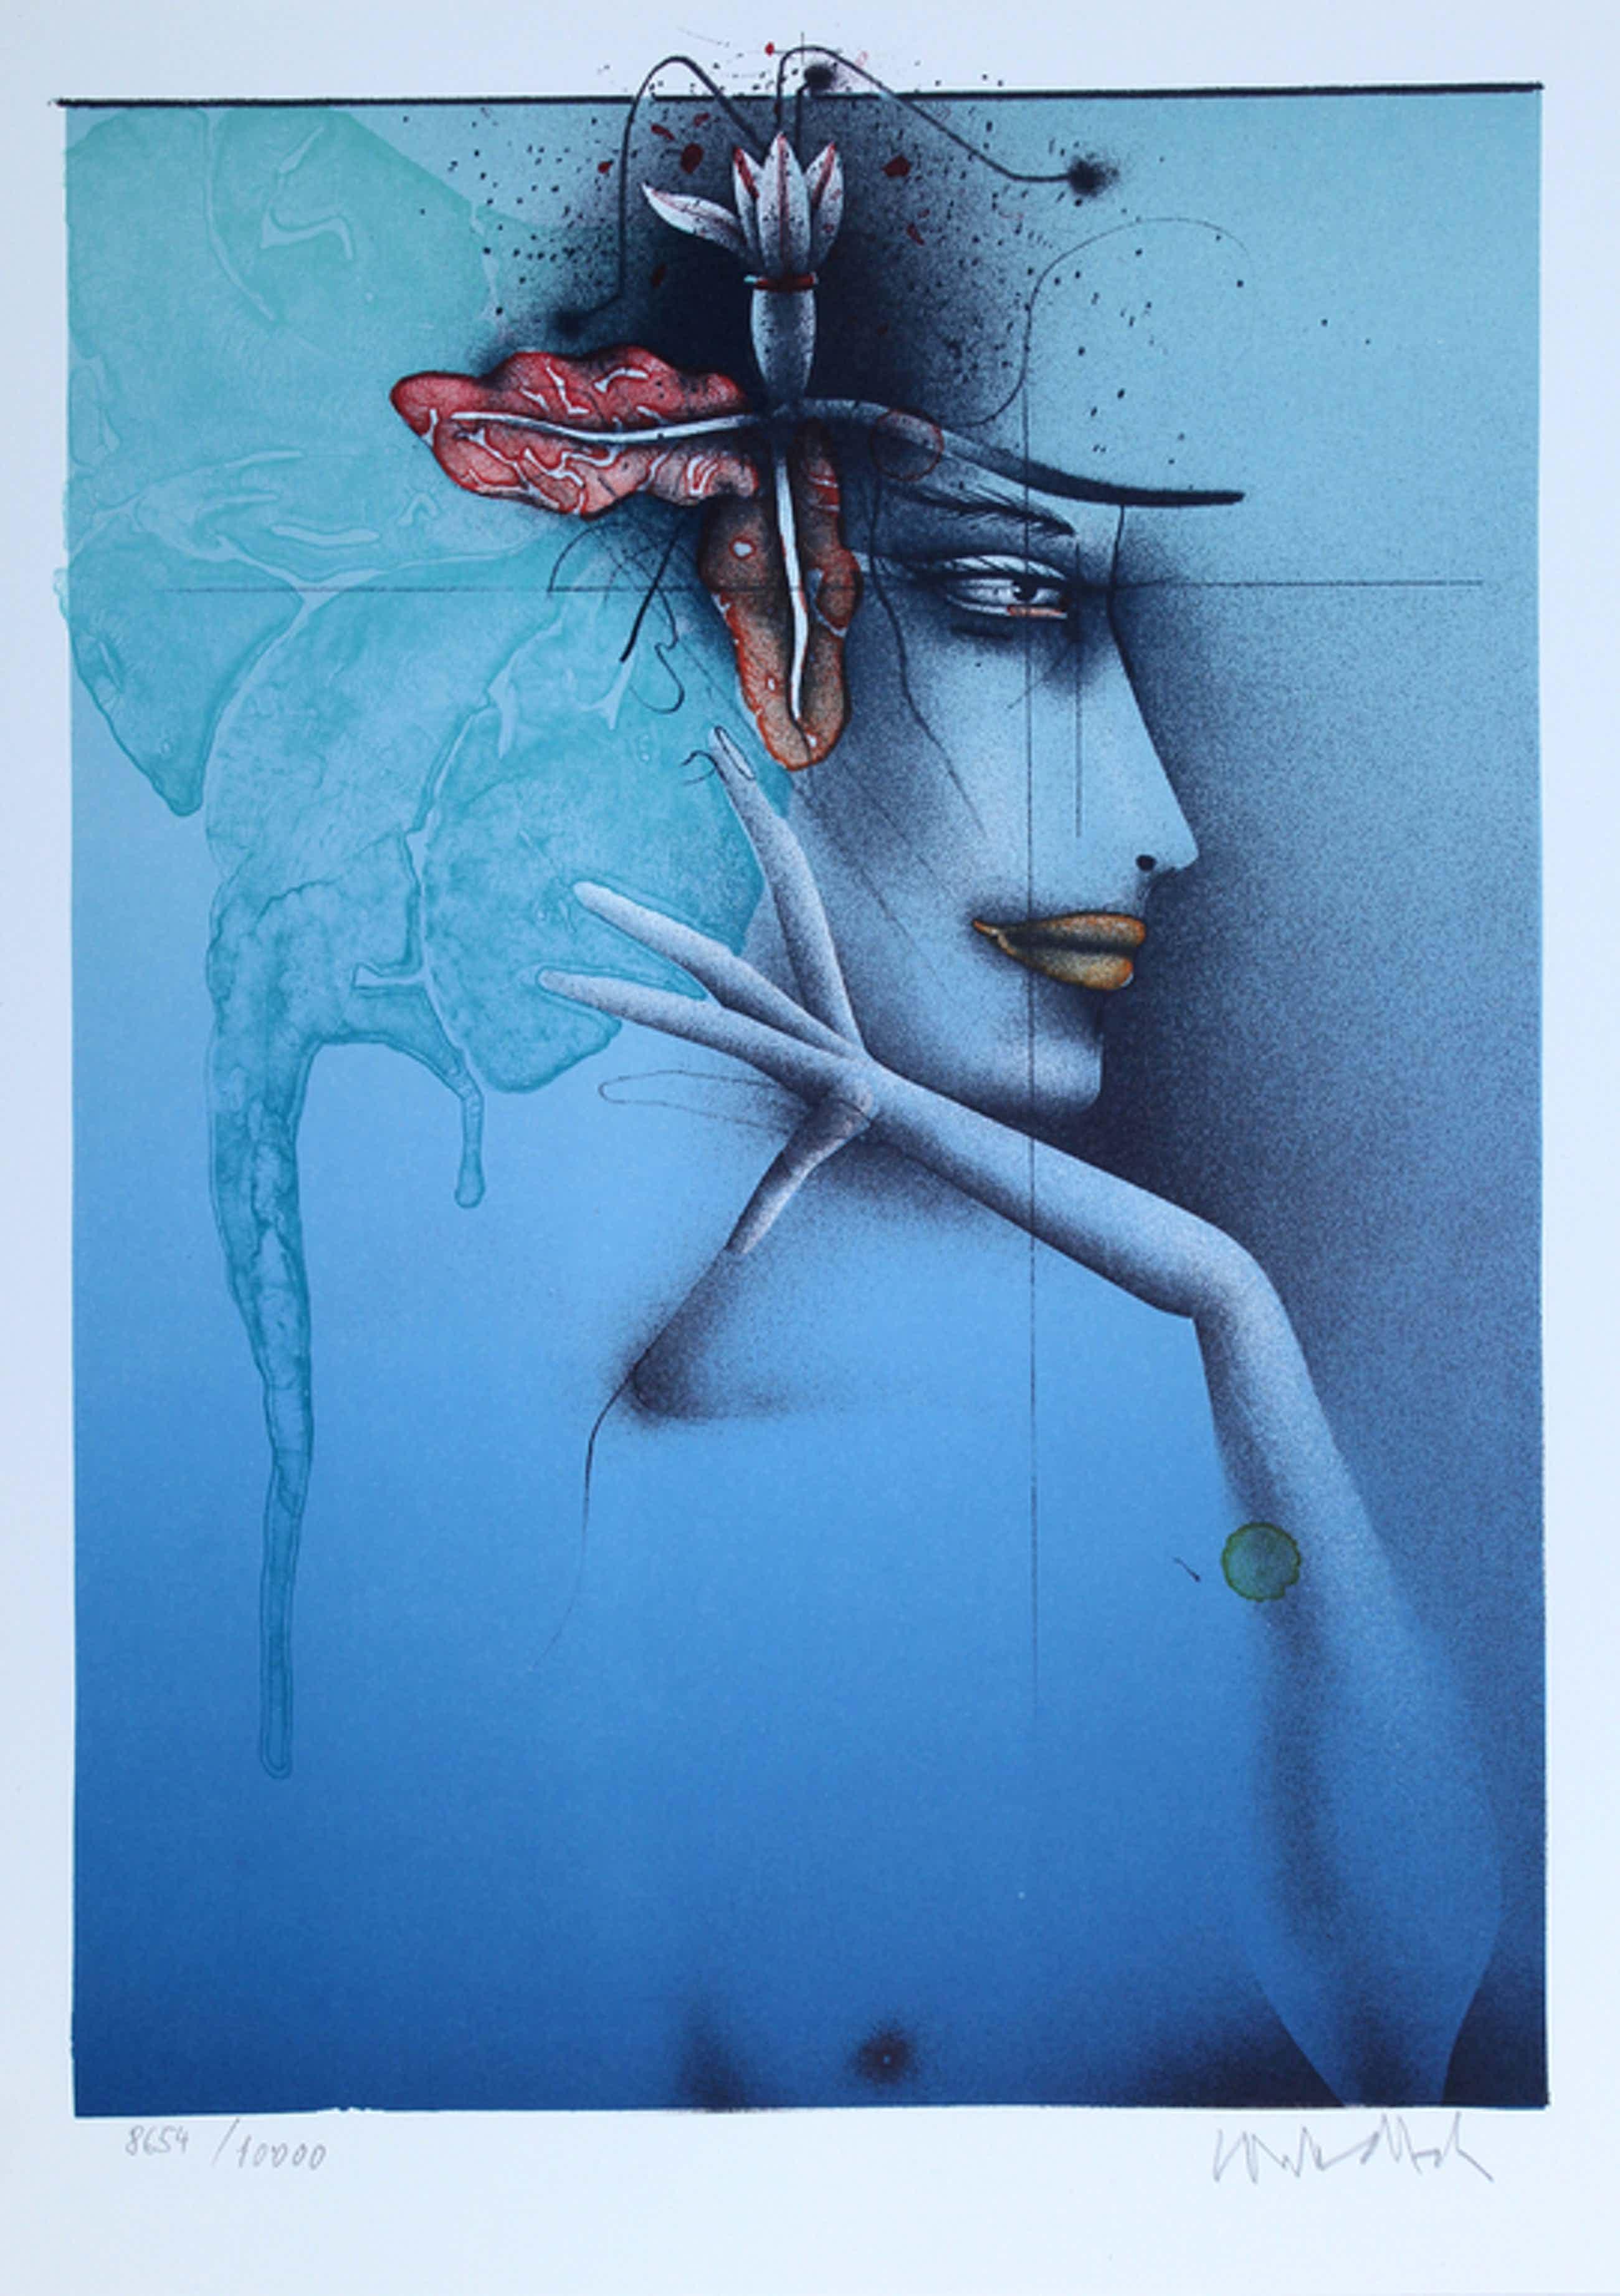 Paul Wunderlich - Lithografie  - Tête d'une femme bleu - gesigneerd - 1982  kopen? Bied vanaf 95!